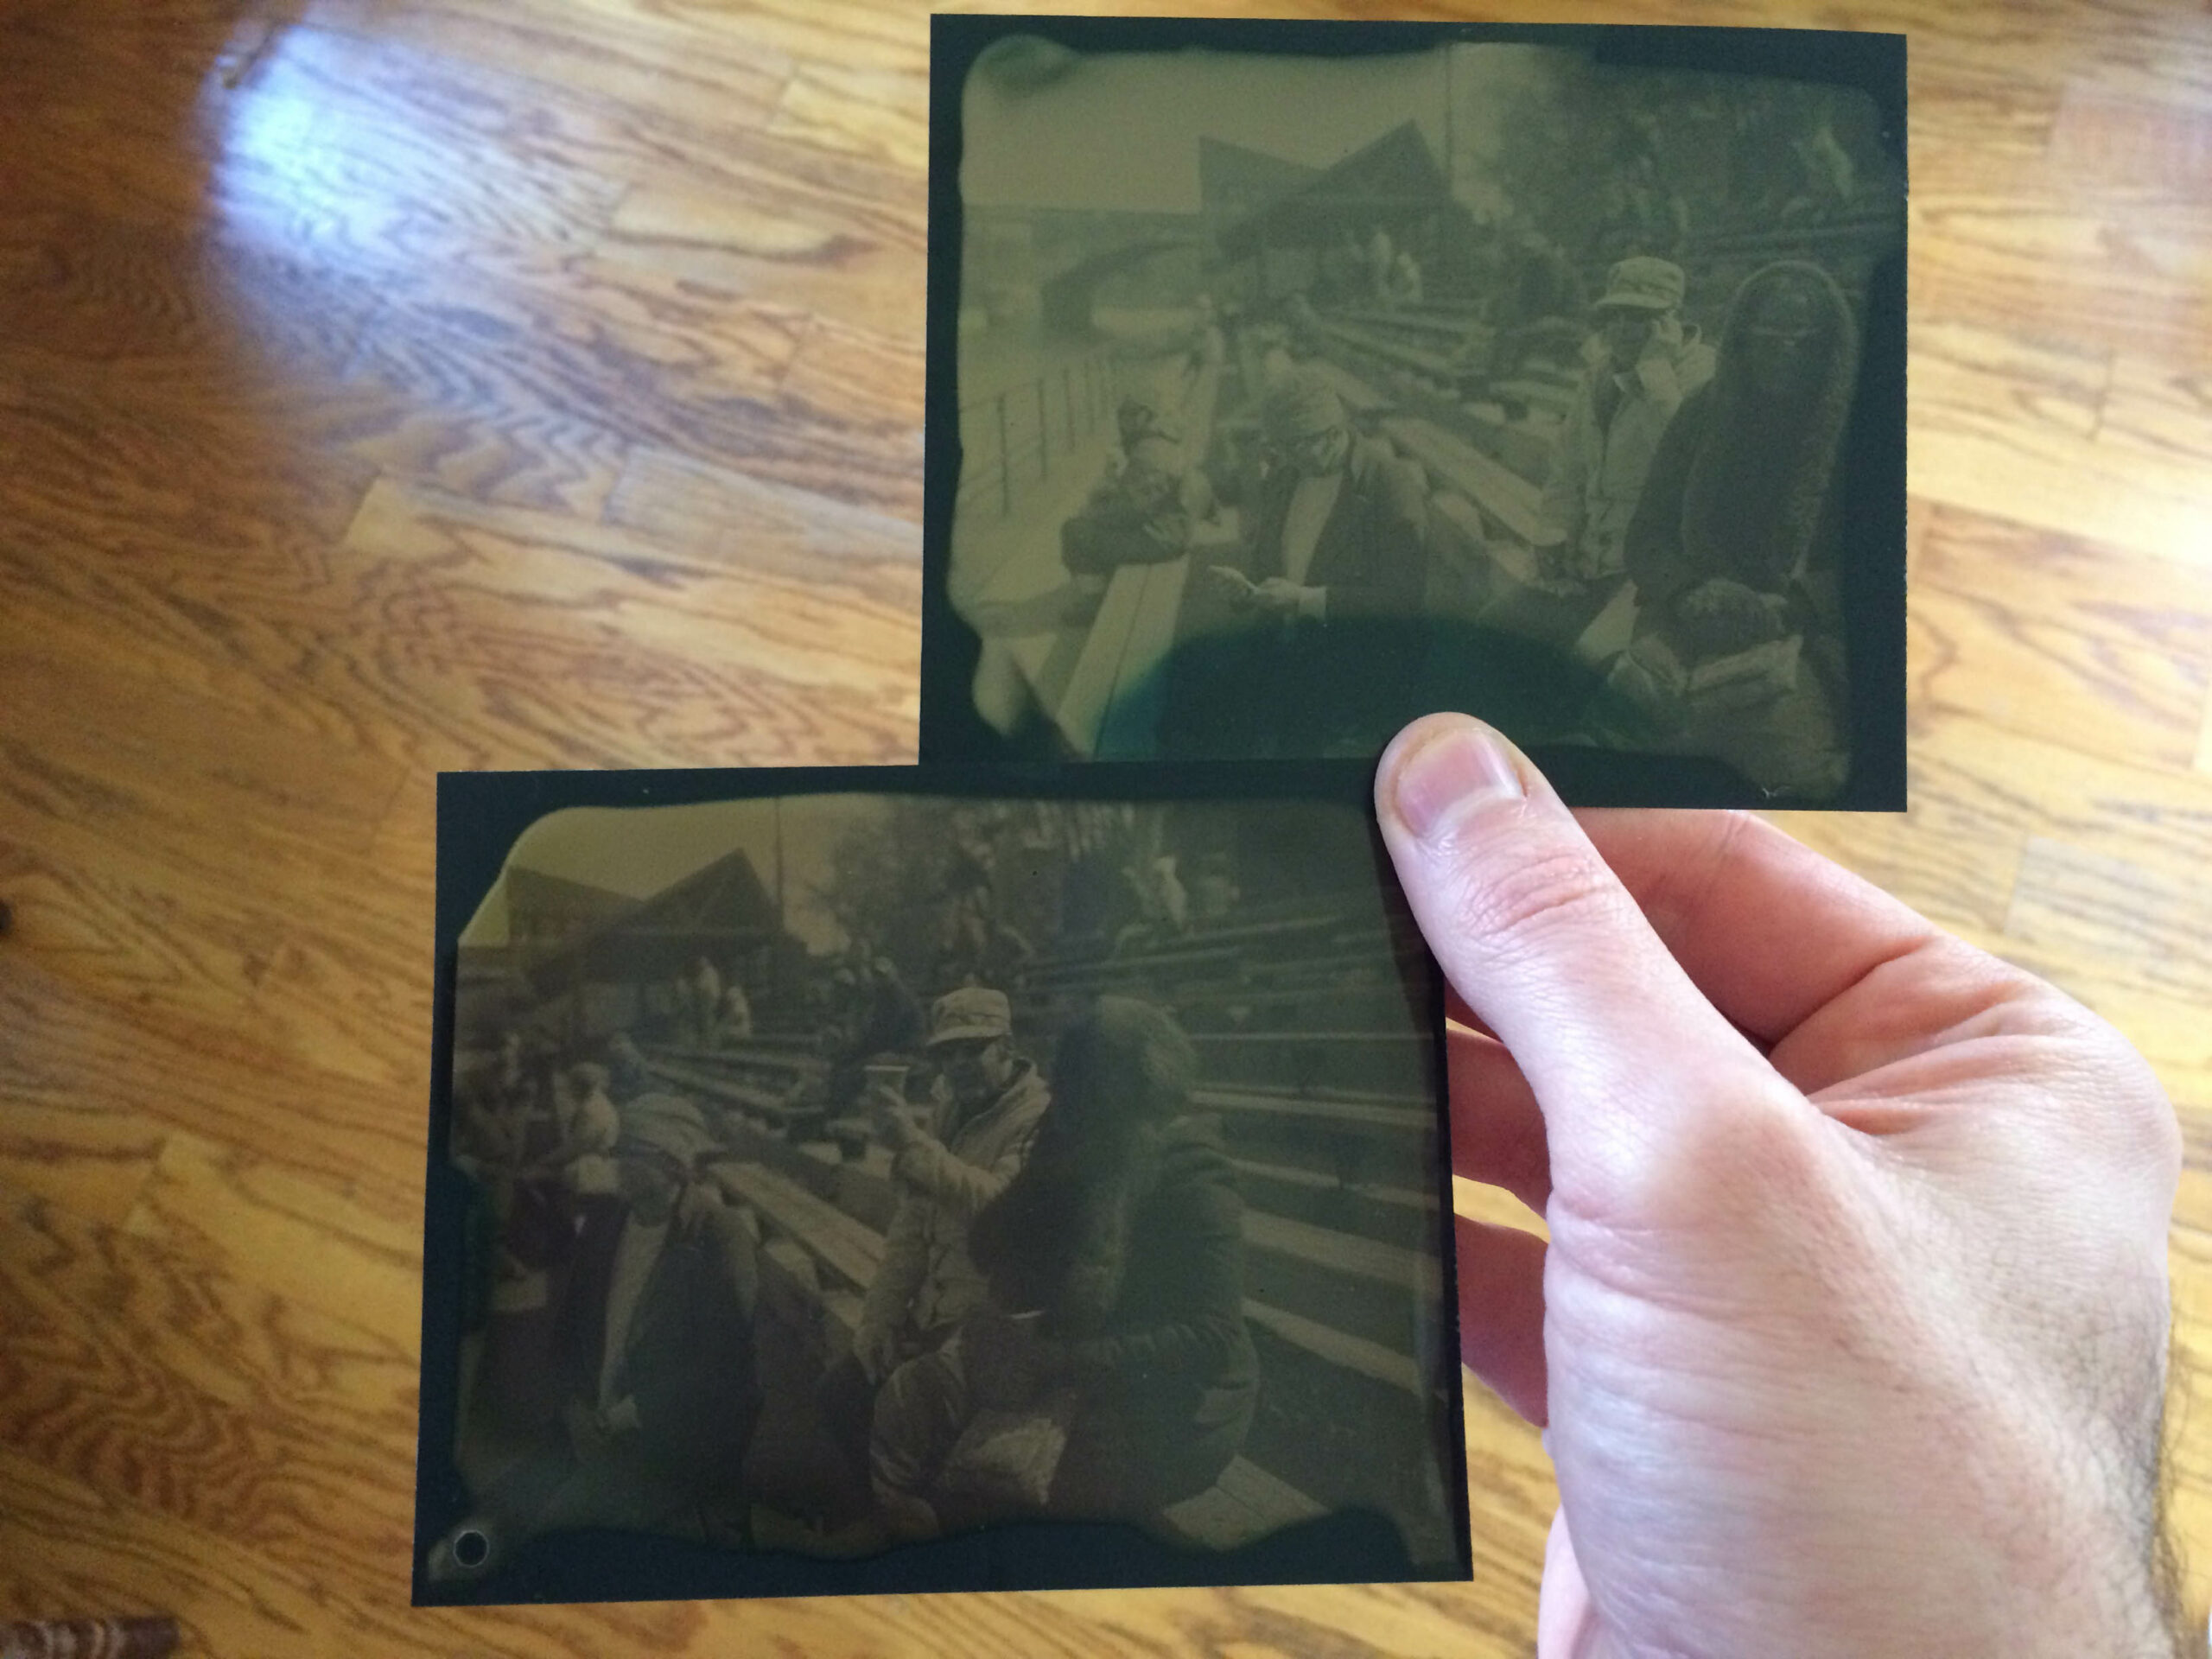 Dry plate tintype developer, redux